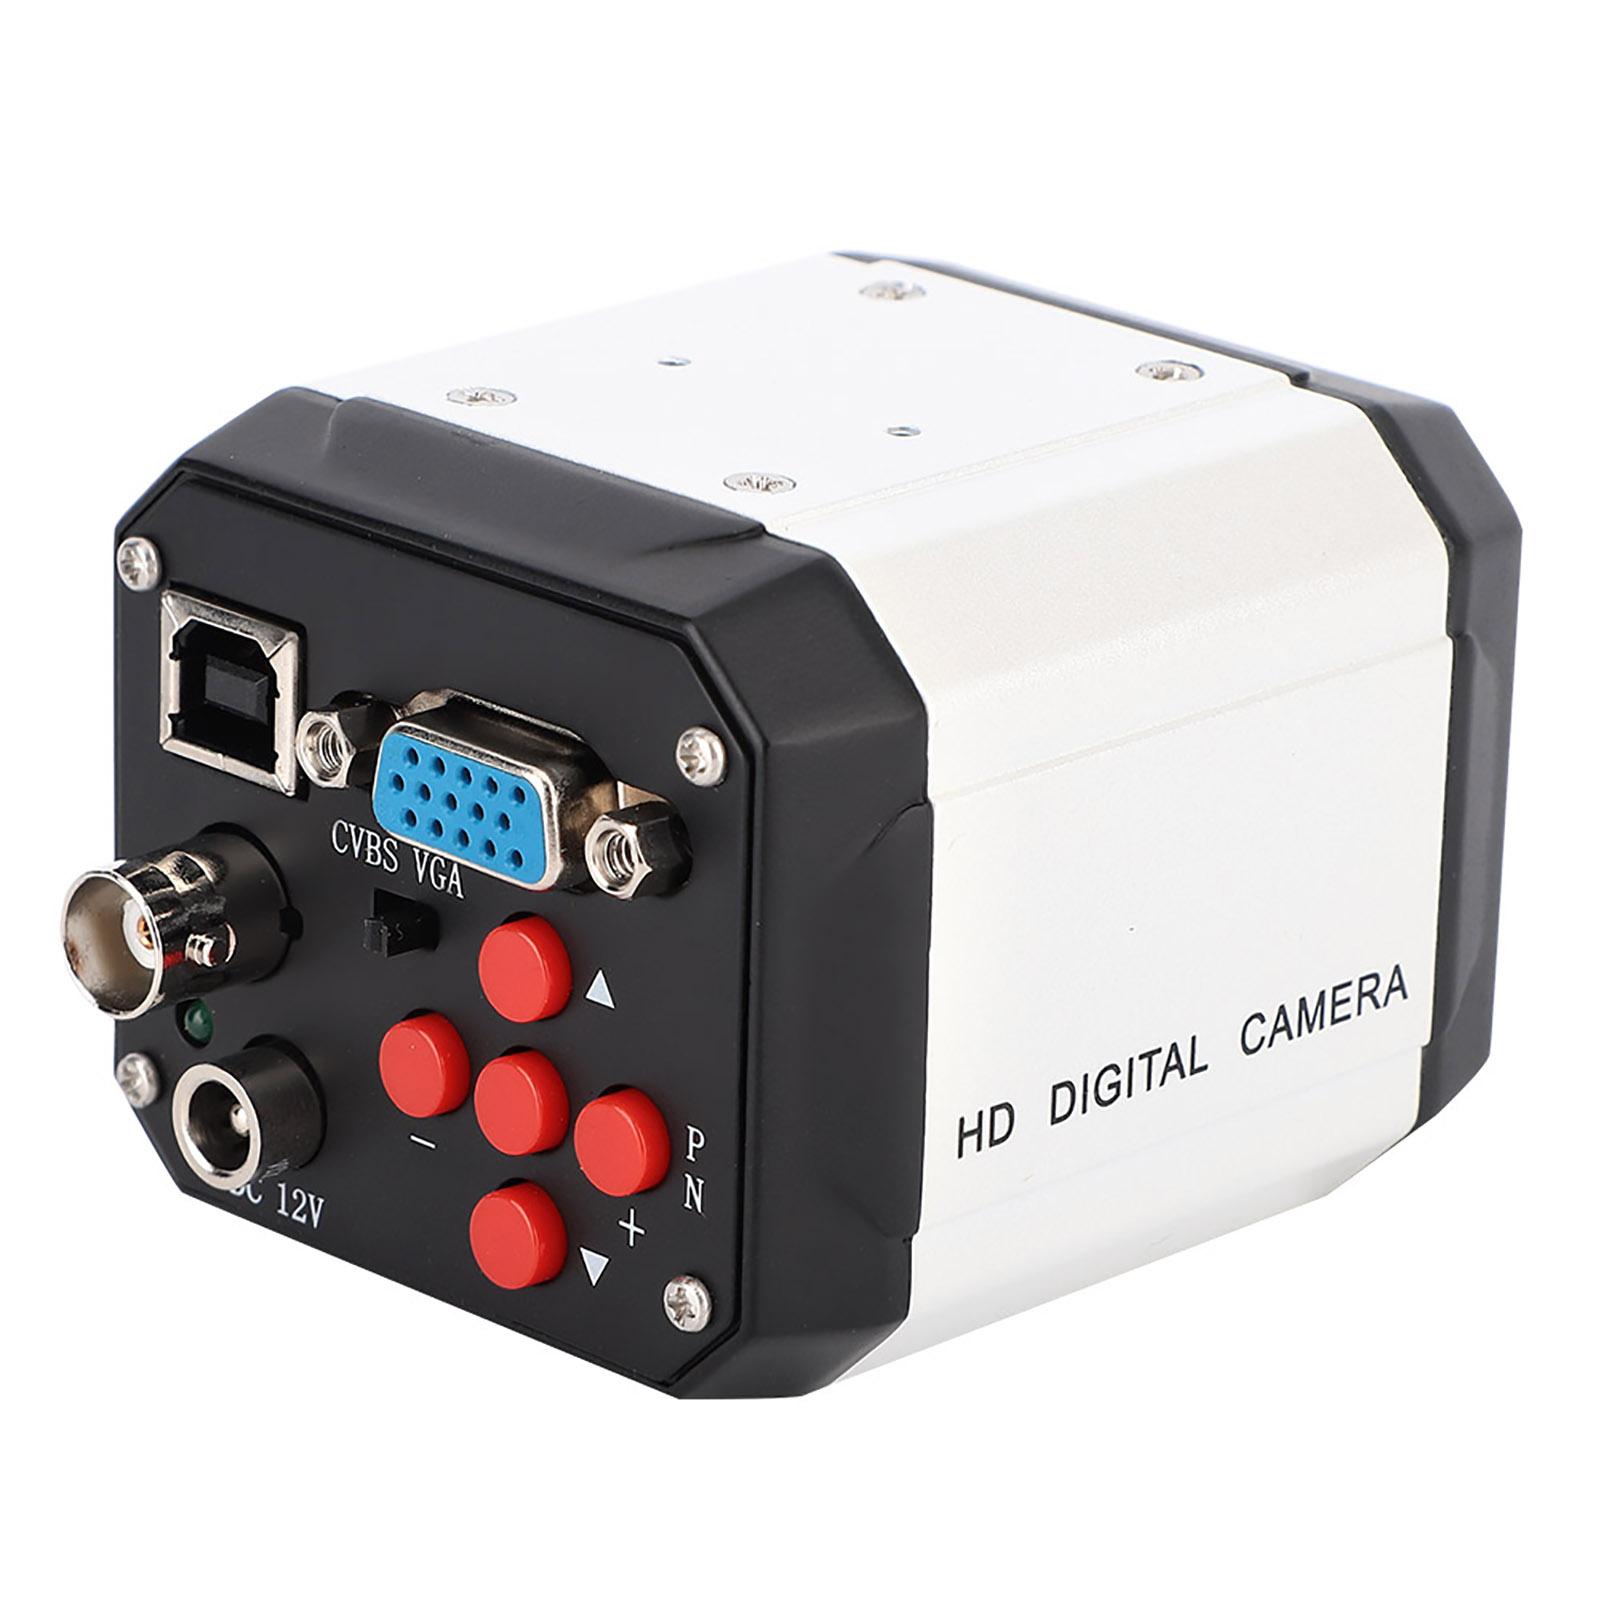 100-240V-2-Megapixel-Industry-Microscope-Camera-C-mount-Video-Camera-1-2-5inch thumbnail 15